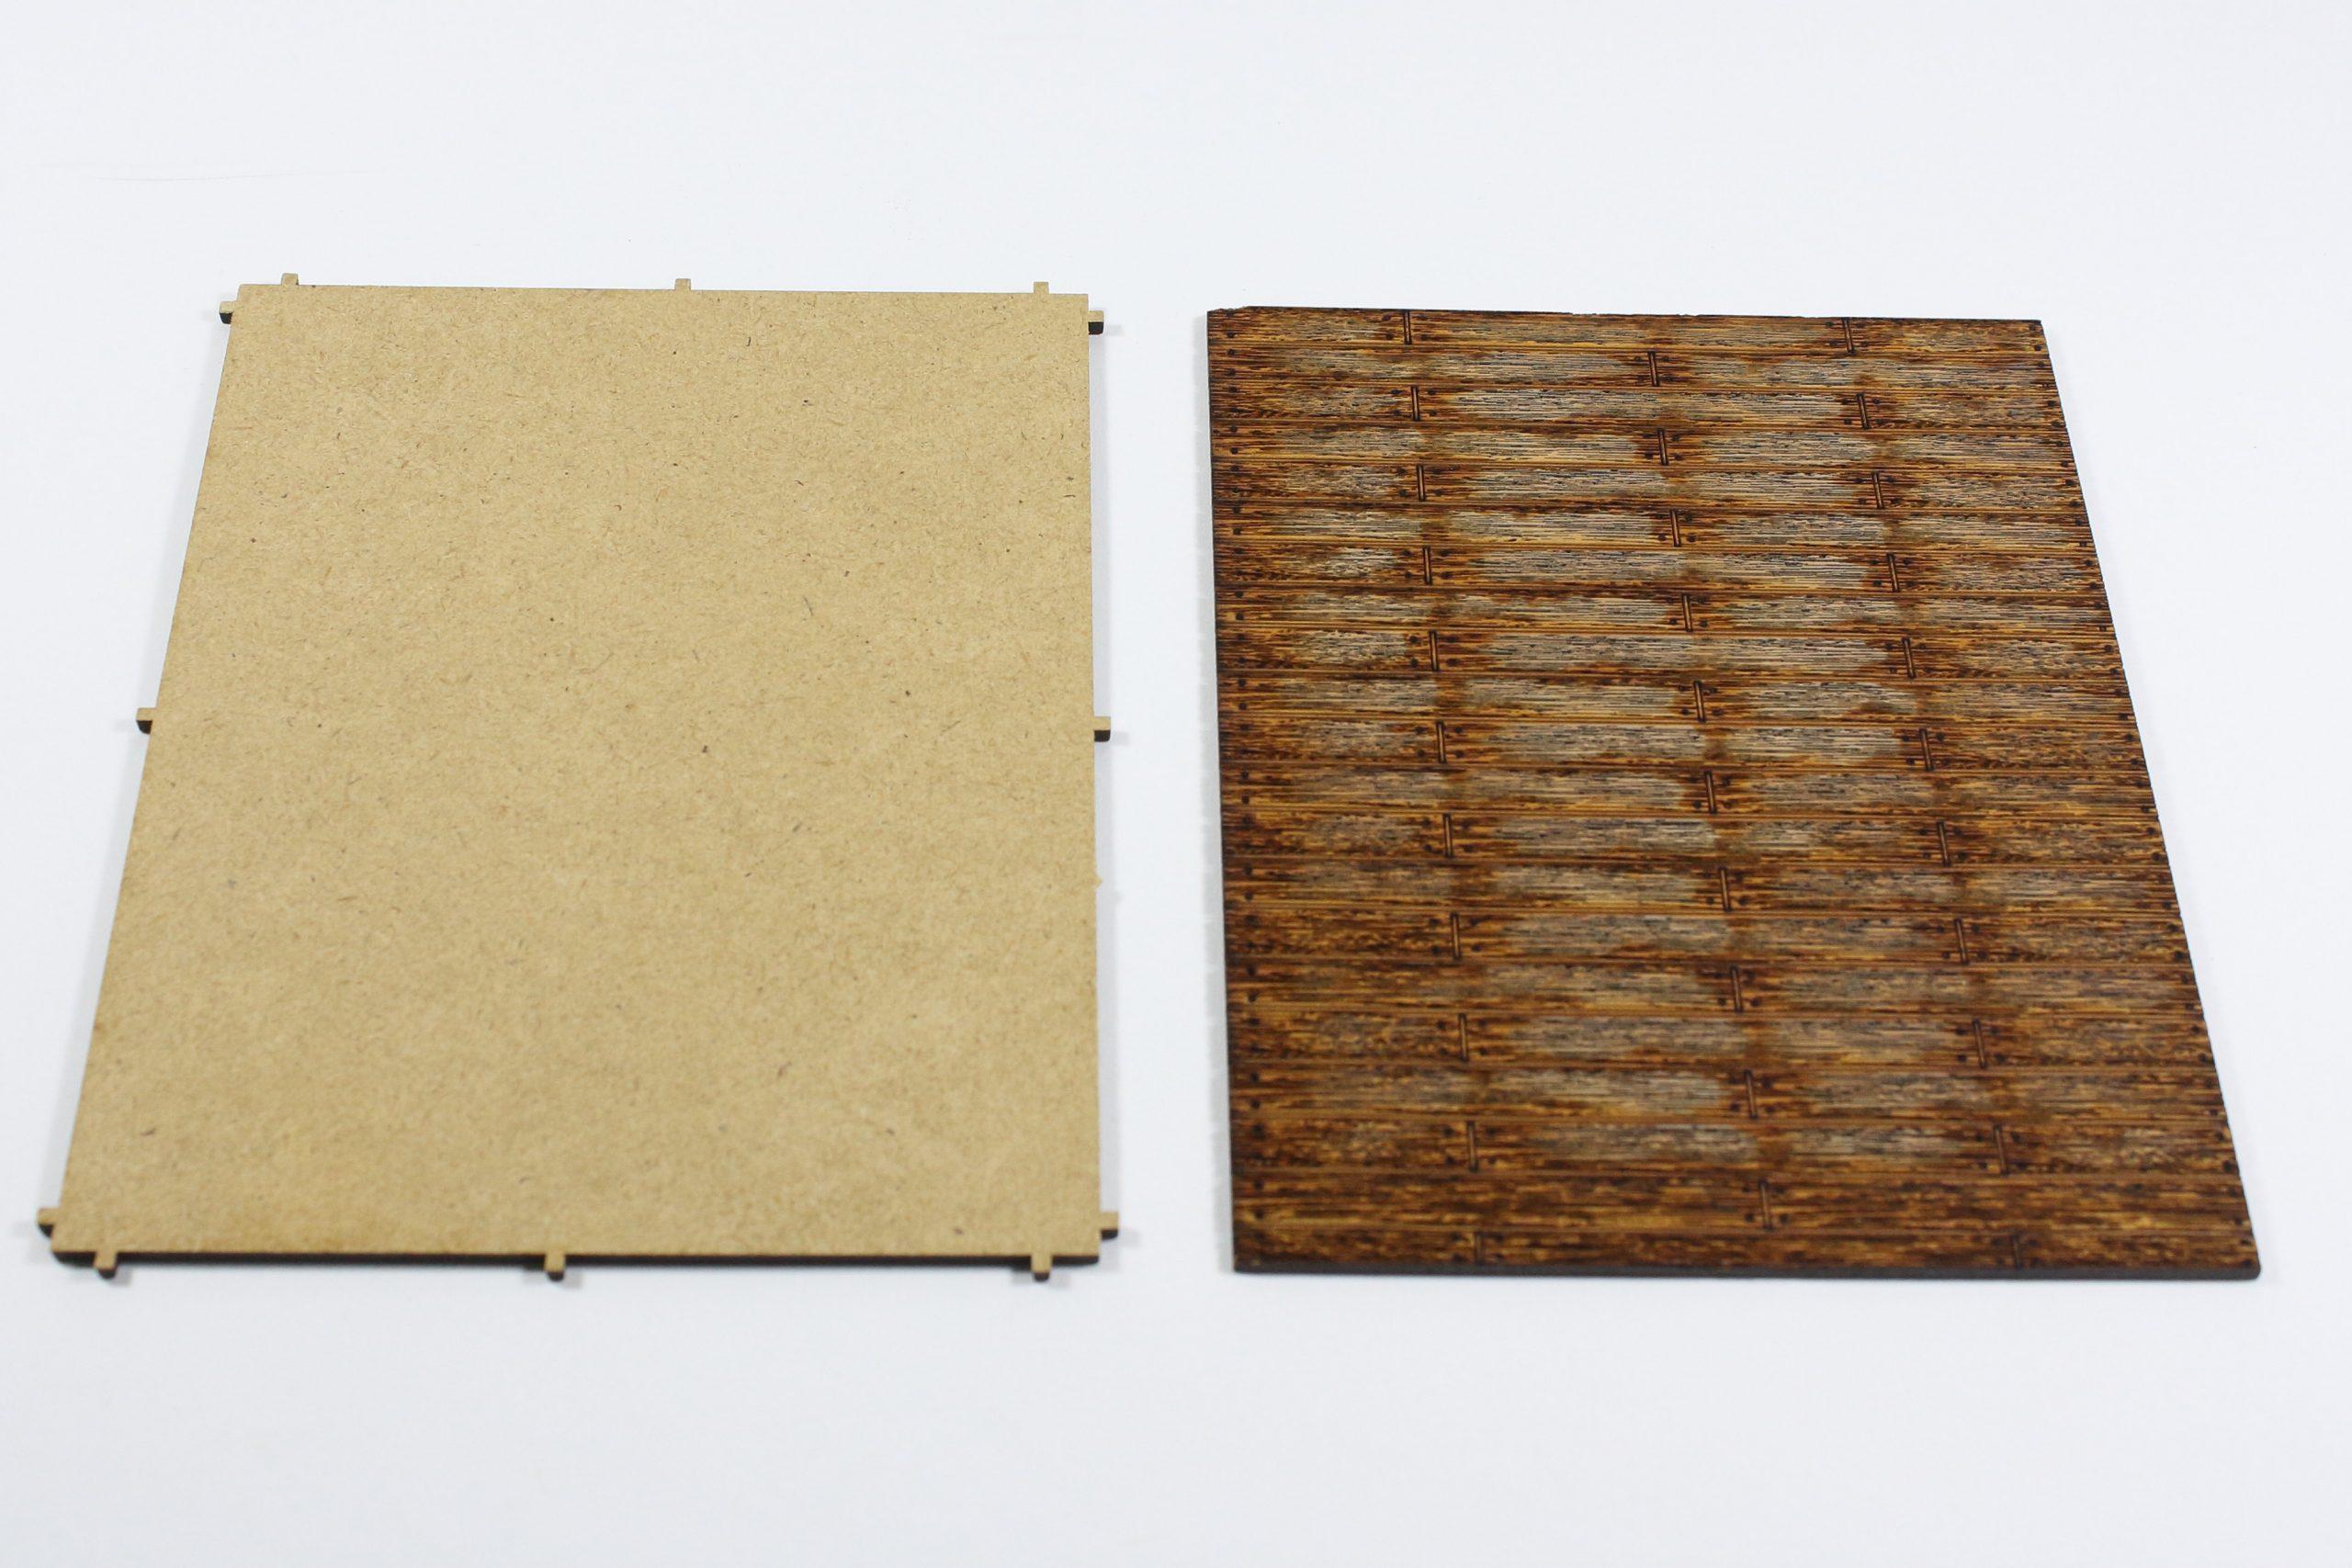 Bild-3-scaled Fachwerkhaus mit Holzschuppen - Lasercut Modellbaushop 1:35